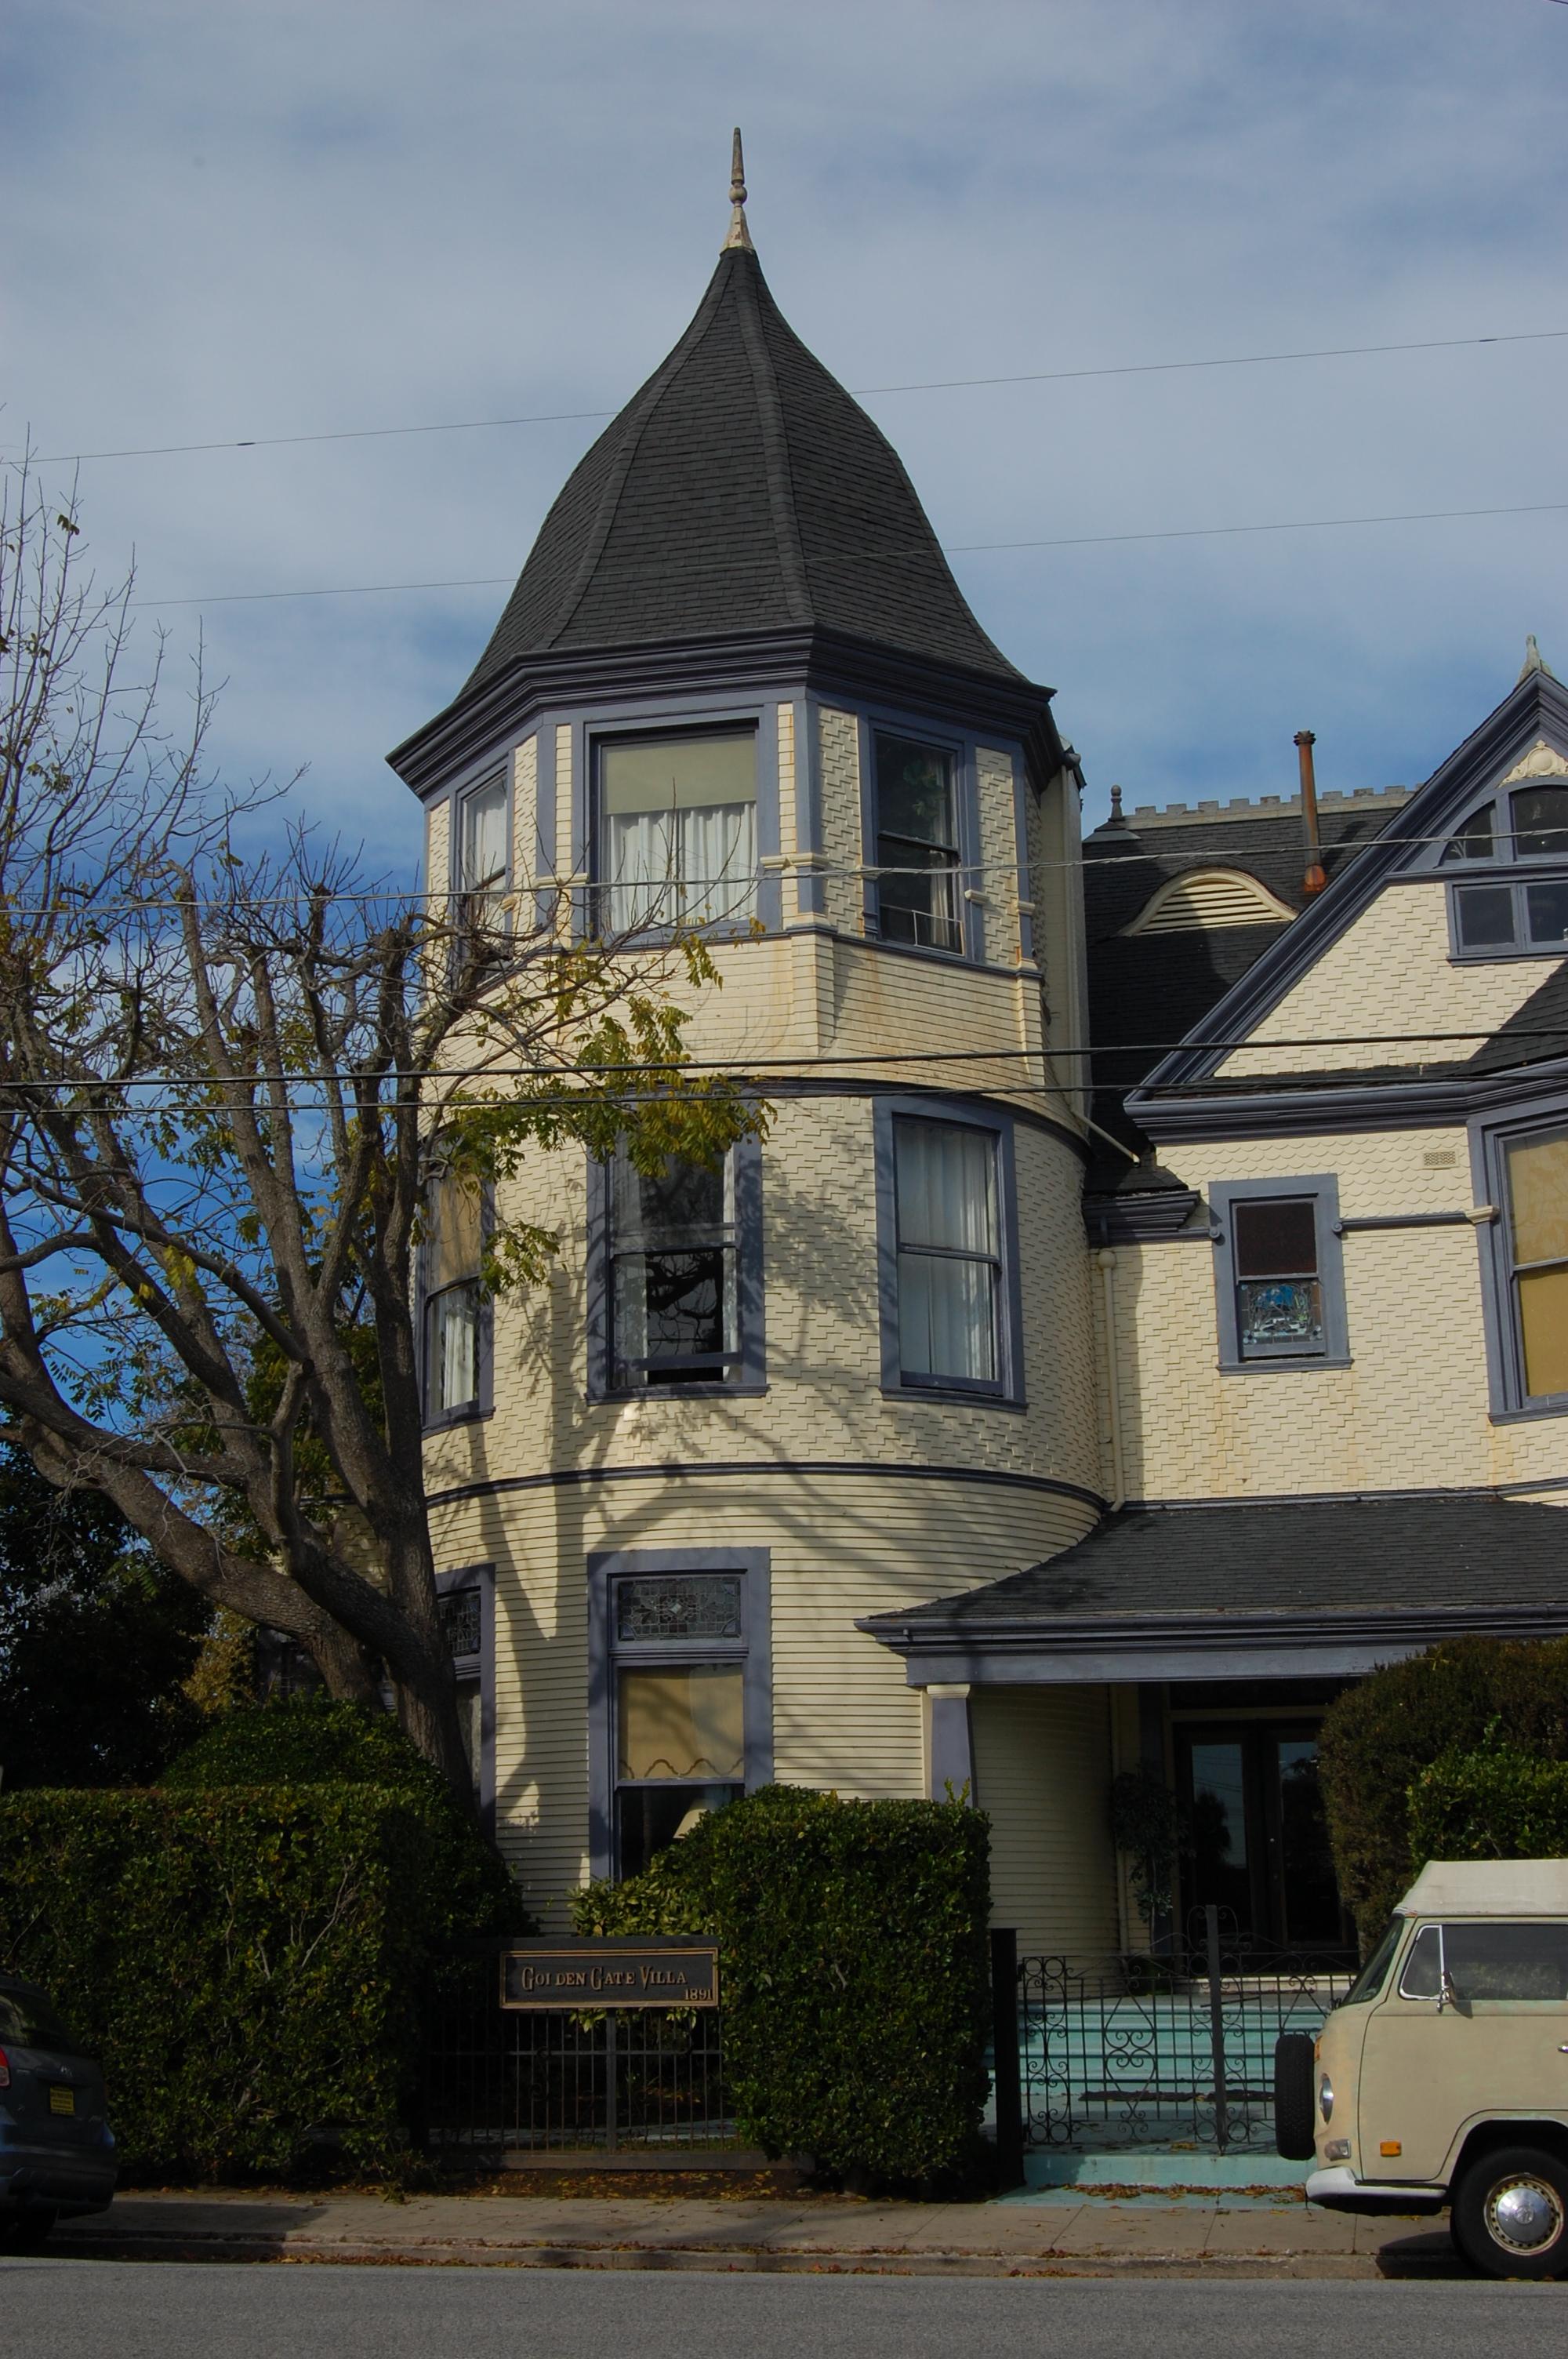 Zillow Santa Cruz File Usa Santa Cruz Golden Gate Villa 3 Jpg Wikimedia